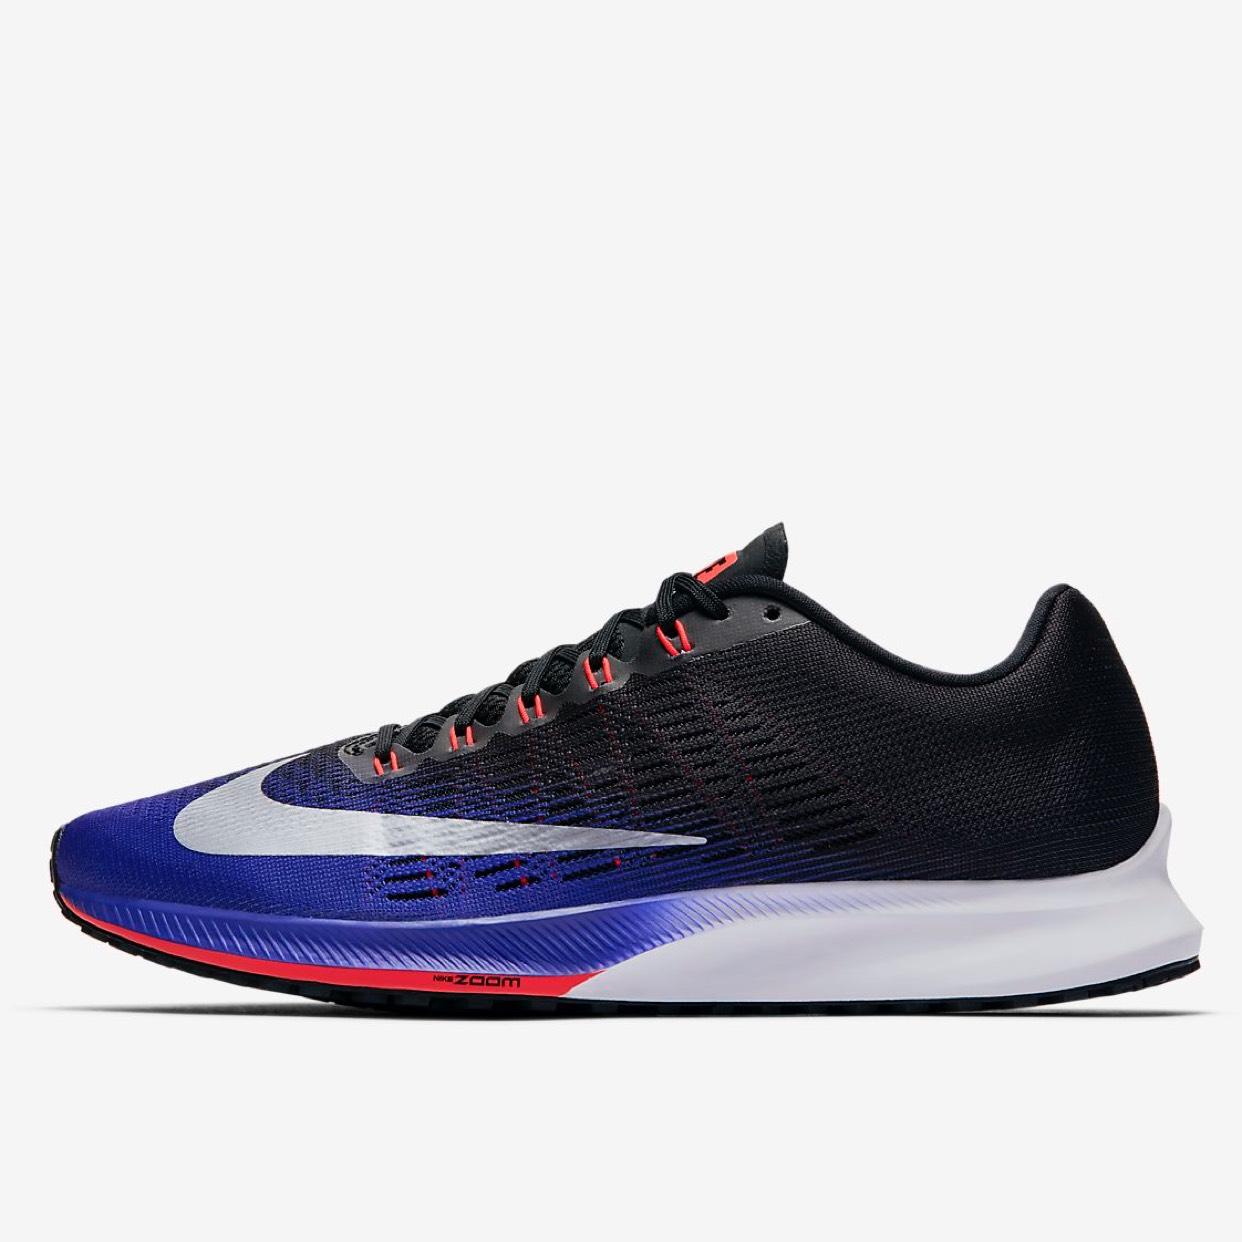 Nike Air Zoom Elite 9 £44.98 @ Nike